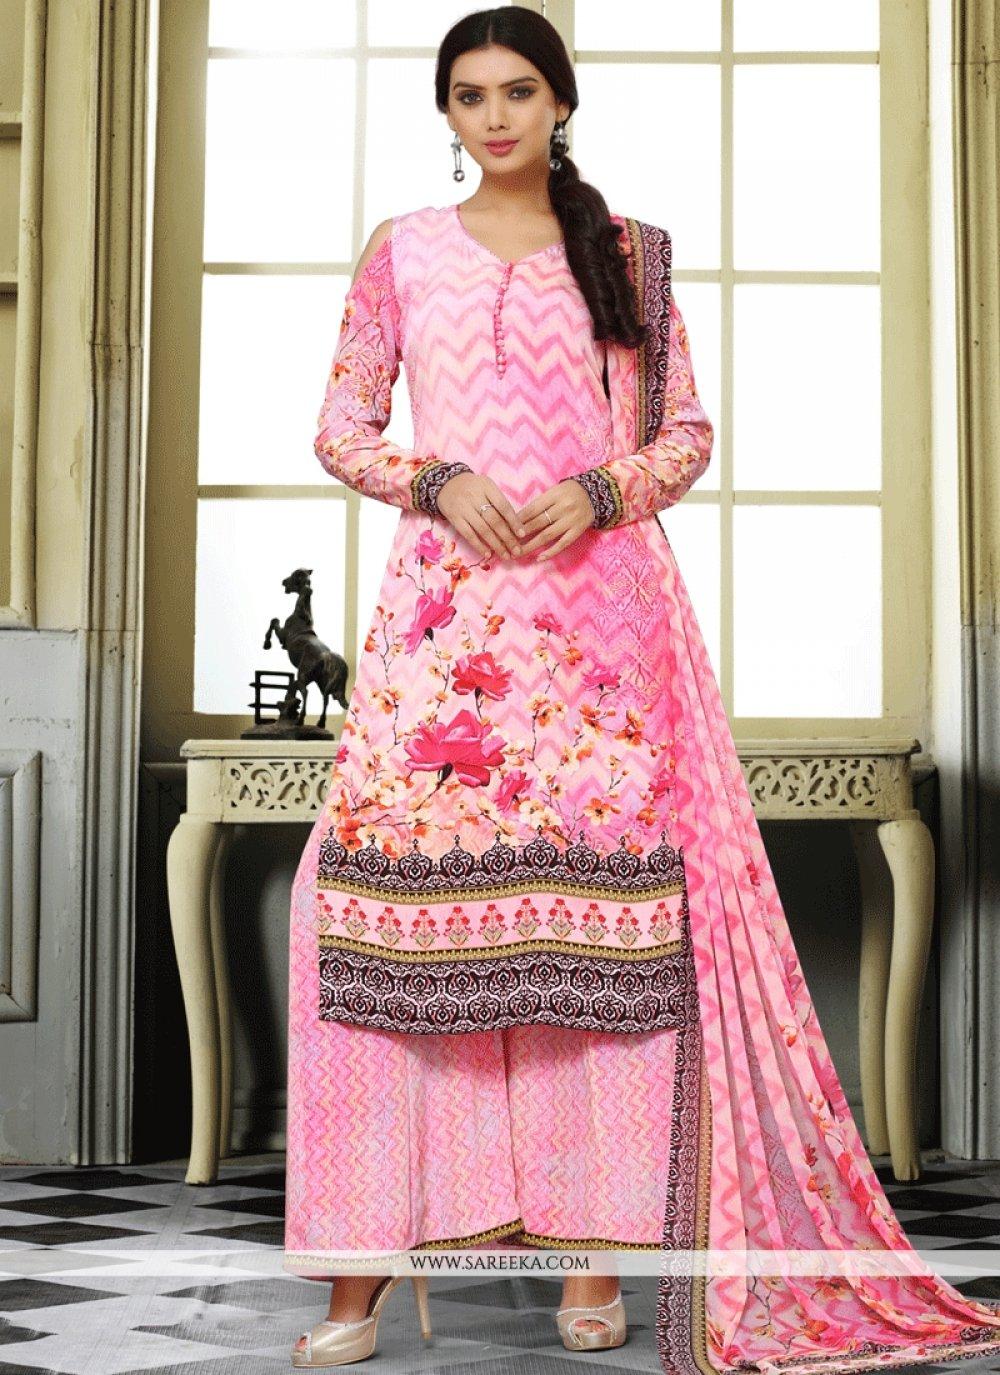 Faux Crepe Pink Print Work Designer Palazzo Salwar Kameez